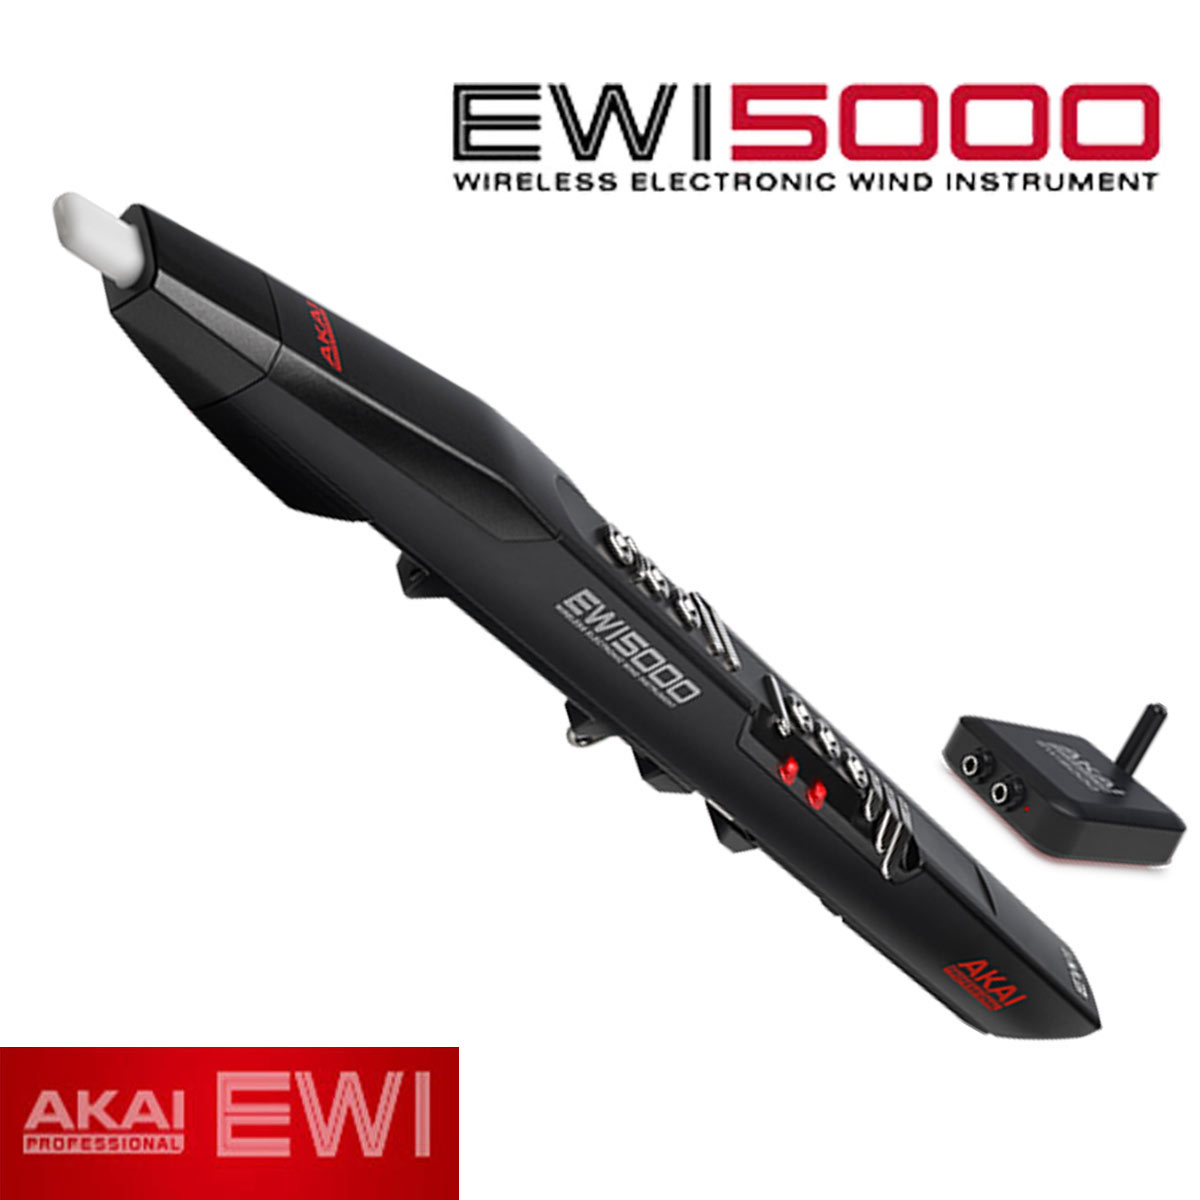 AKAI professional / EWI-5000 アカイ ウィンドシンセ EWI5000《正規品》